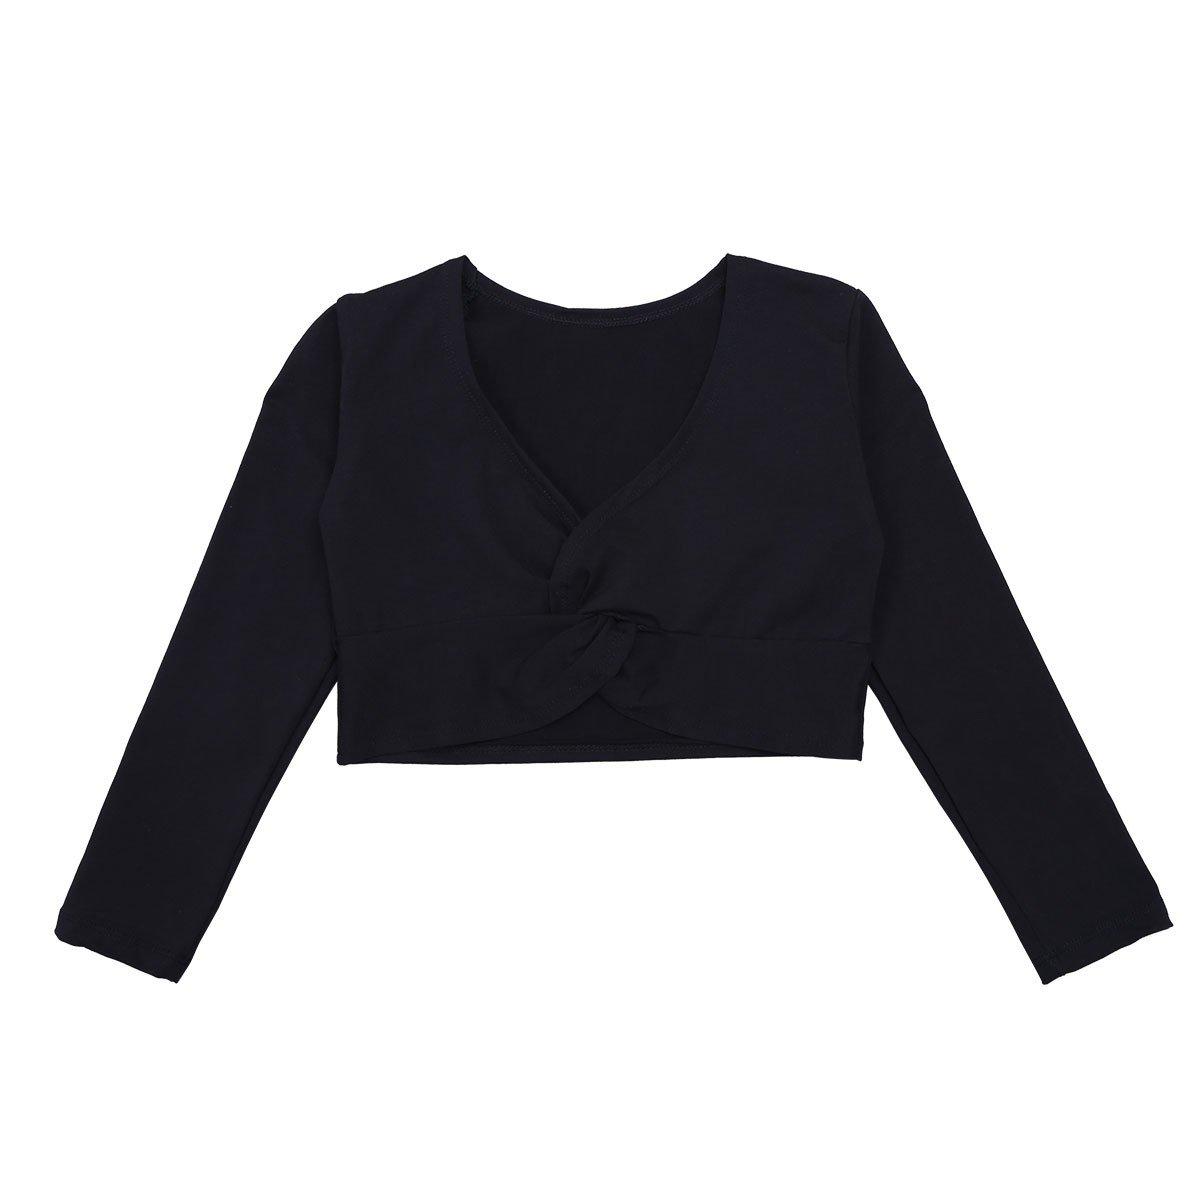 Freebily Kids Girls' Classics Long Sleeve Wrap Top Dance Ballerina Tshirt Dress Black 7-8